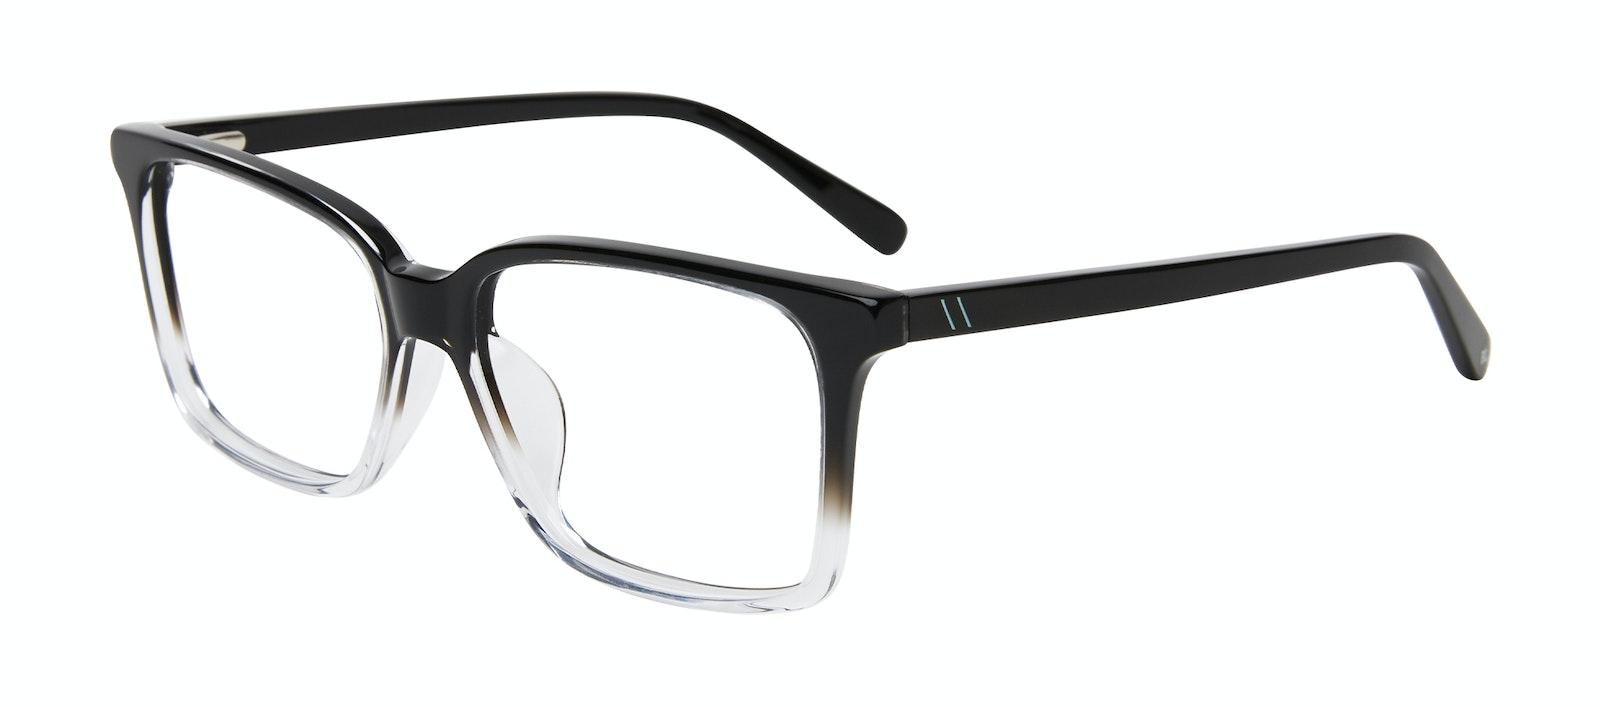 Affordable Fashion Glasses Square Eyeglasses Men Lapel XL Onyx Clear Tilt